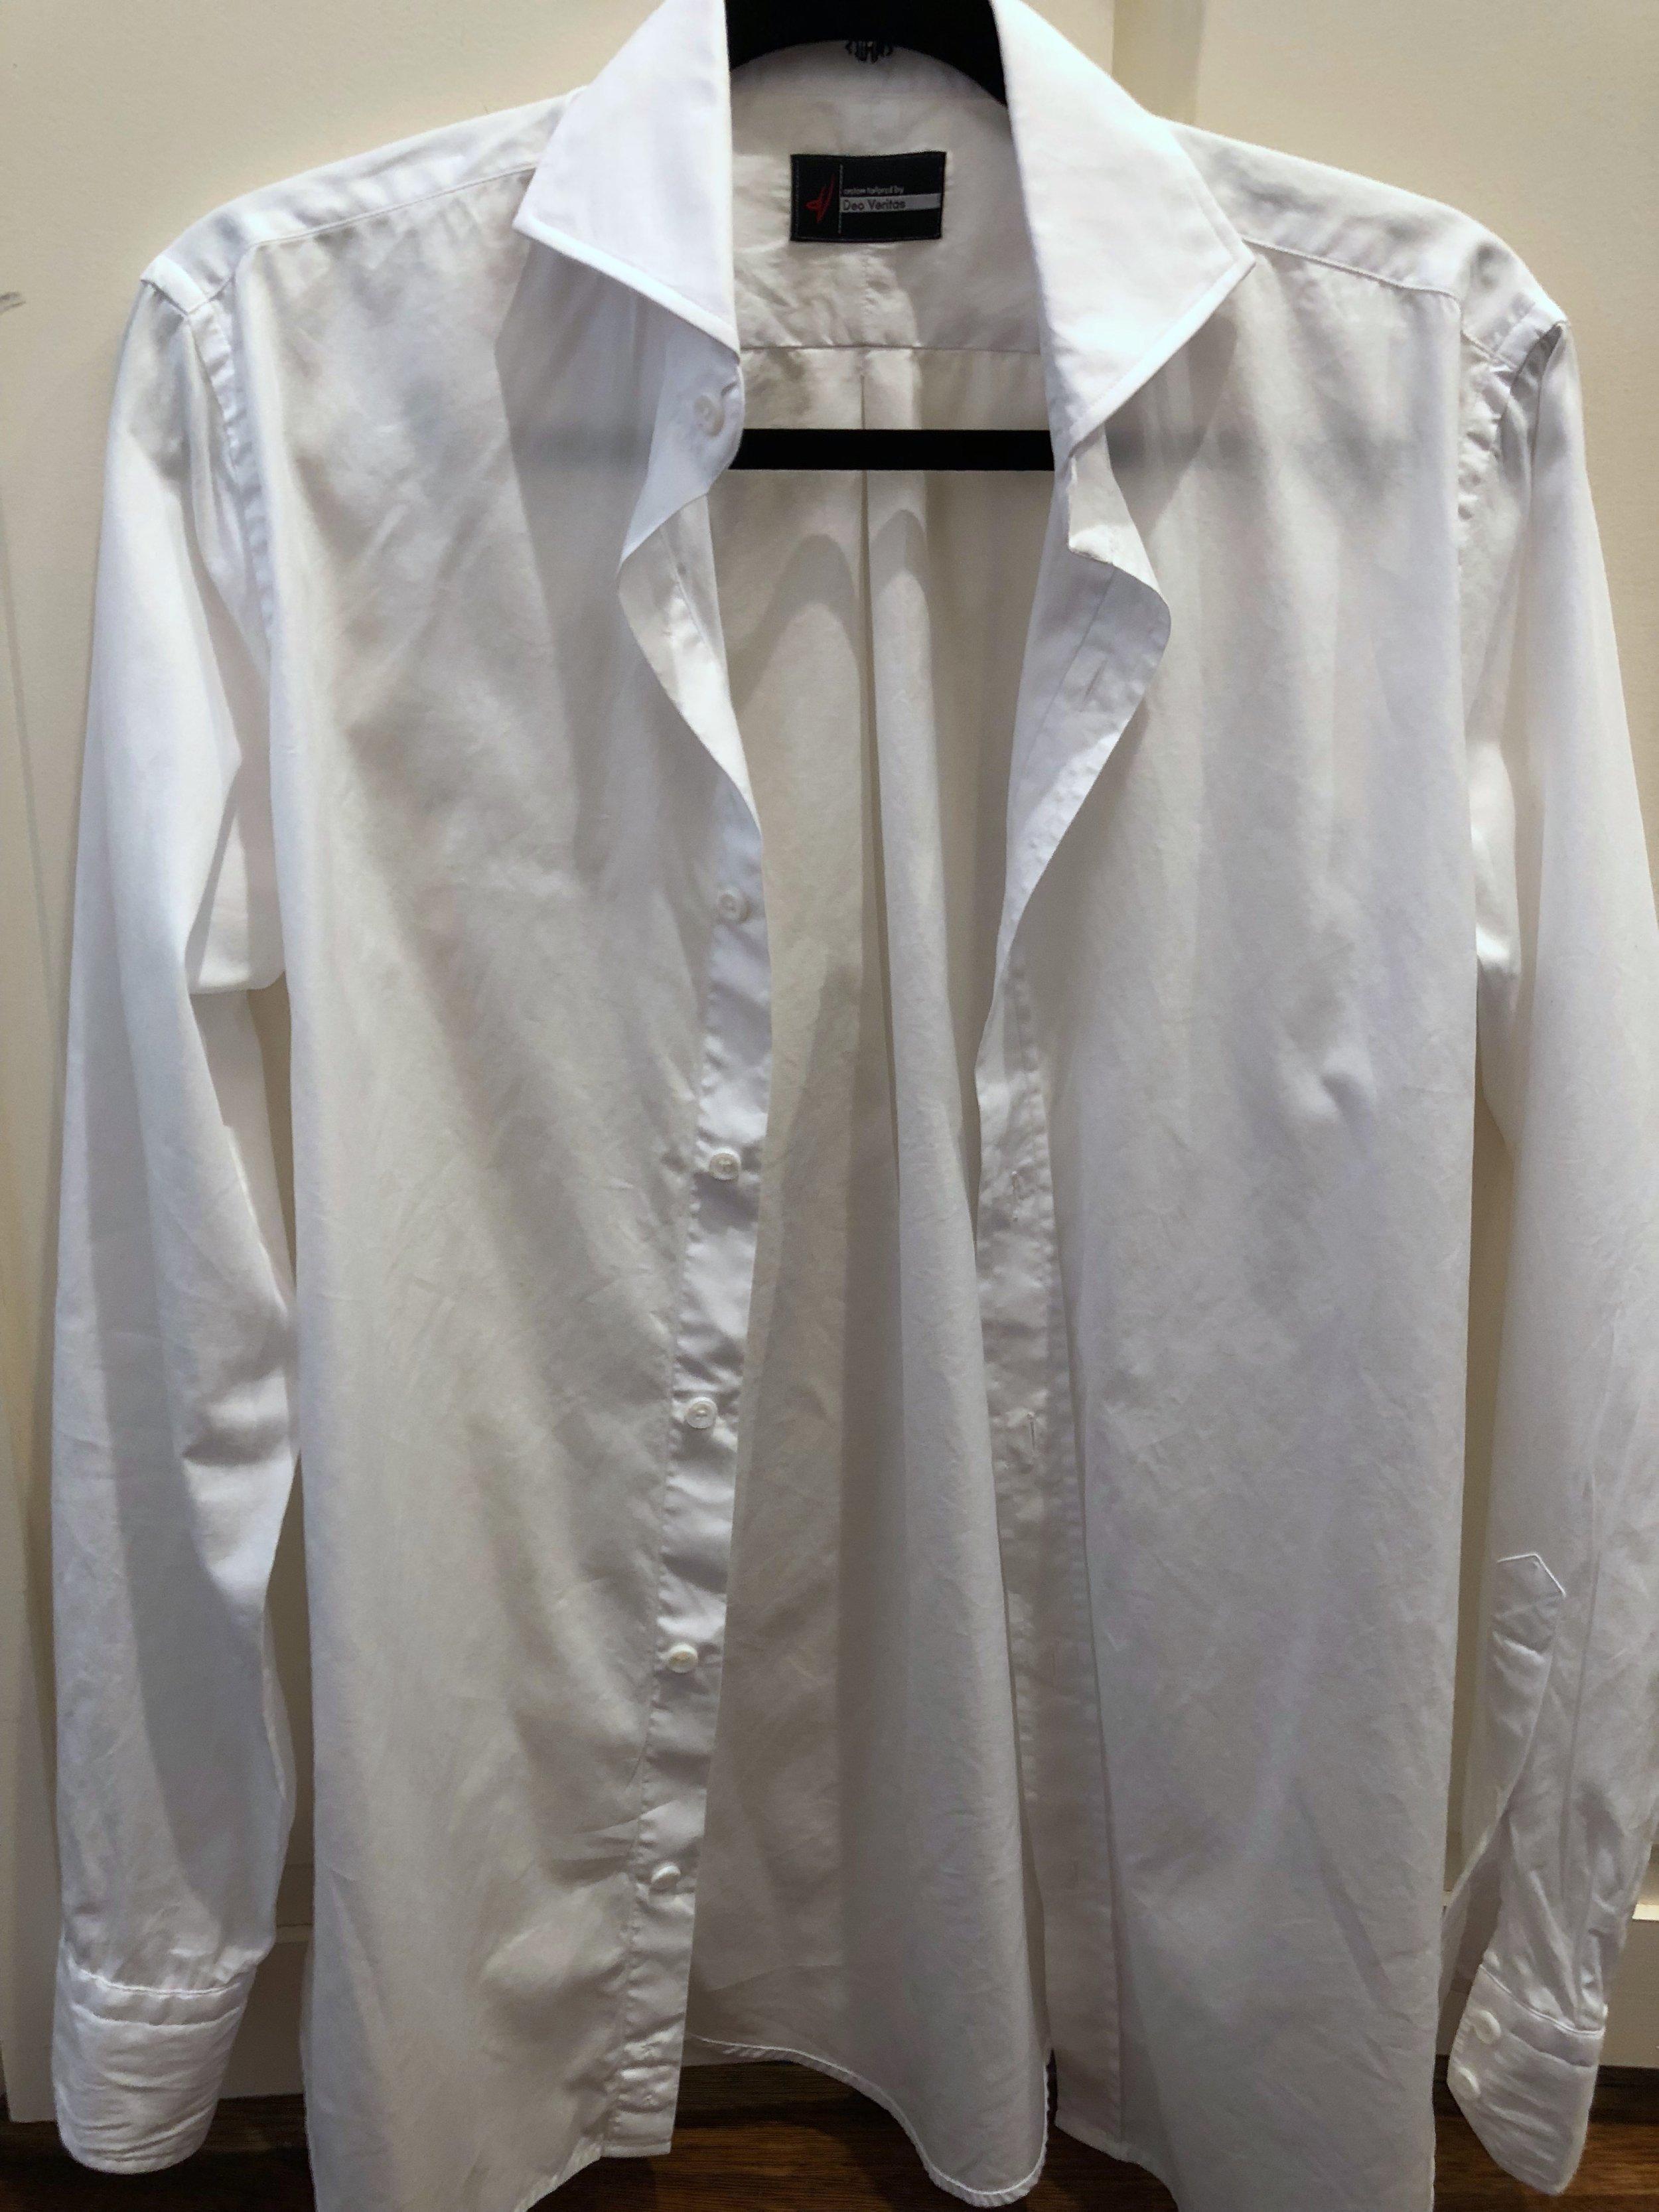 The white dress shirt